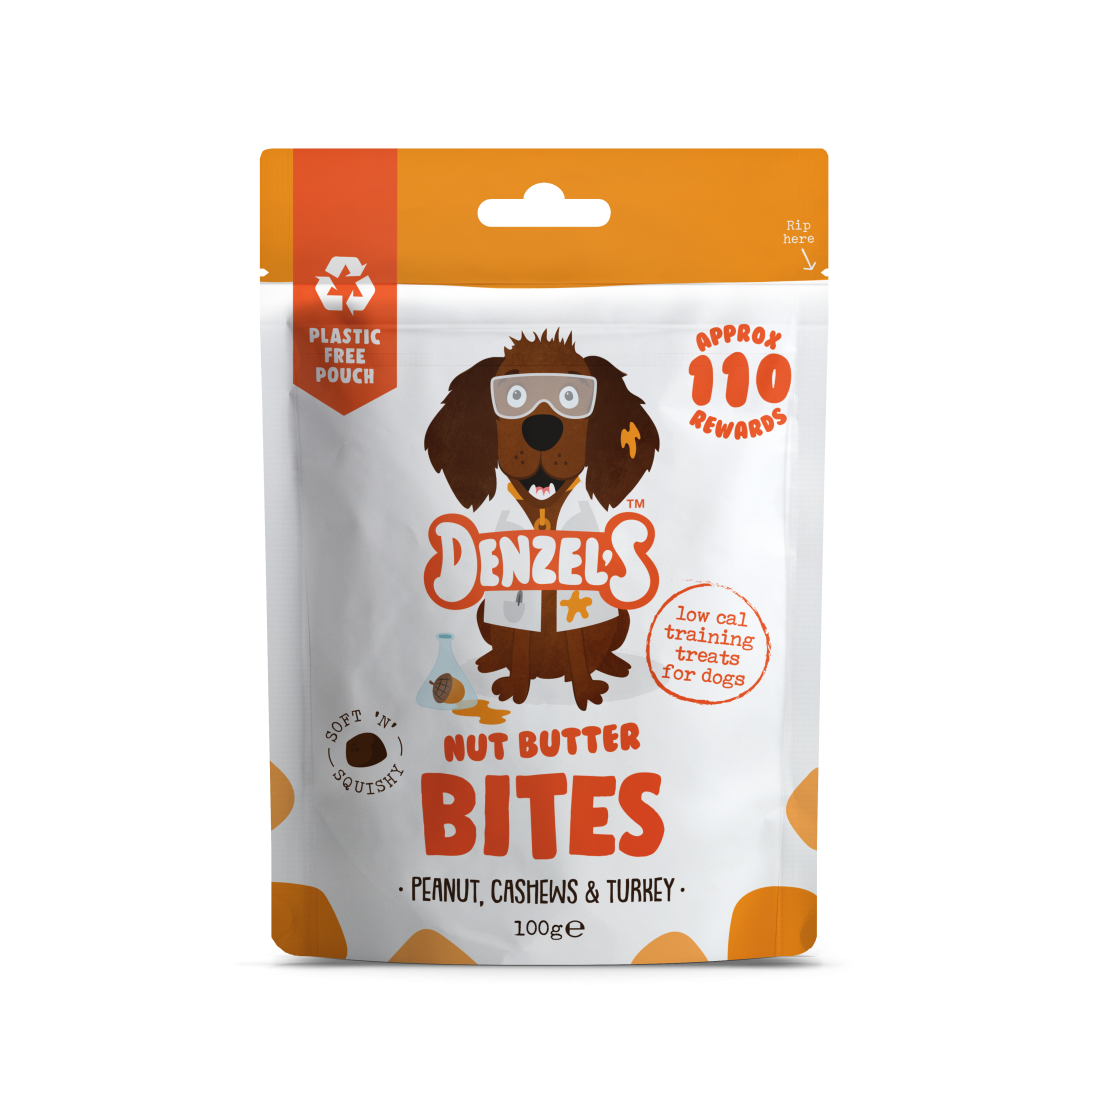 Denzel's Nut Butter Bites For Dogs Peanut Cashews & Turkey 100g